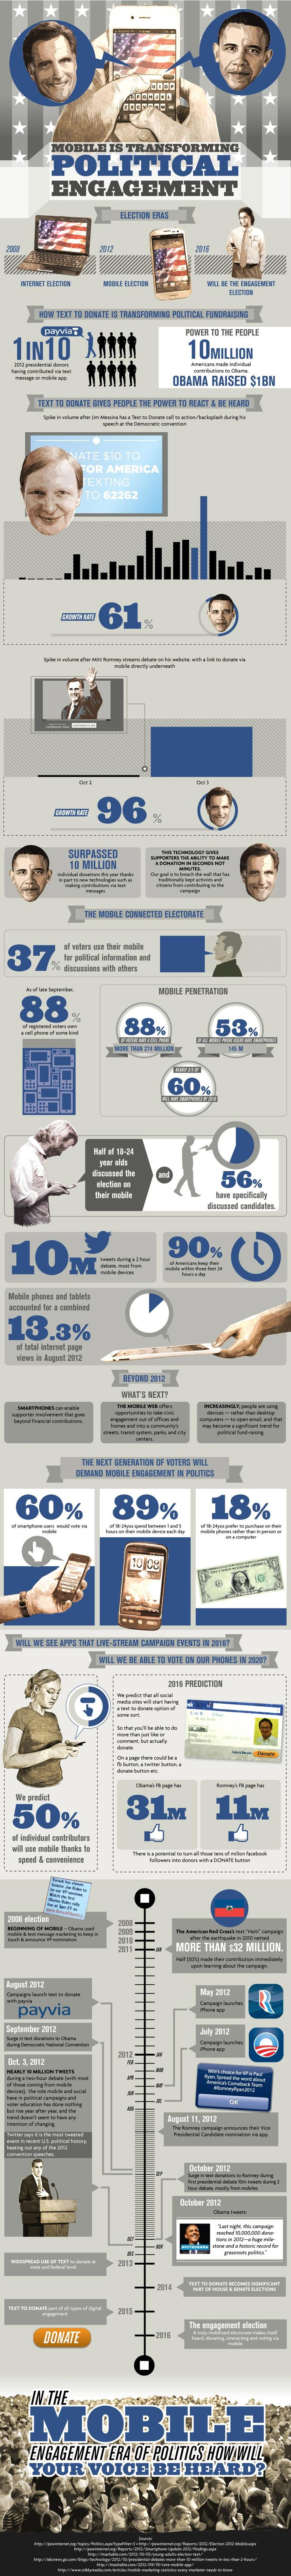 https://social-media-strategy-template.blogspot.com/ El móvil está cambiando el engagement político #infografia #infographic #marketing